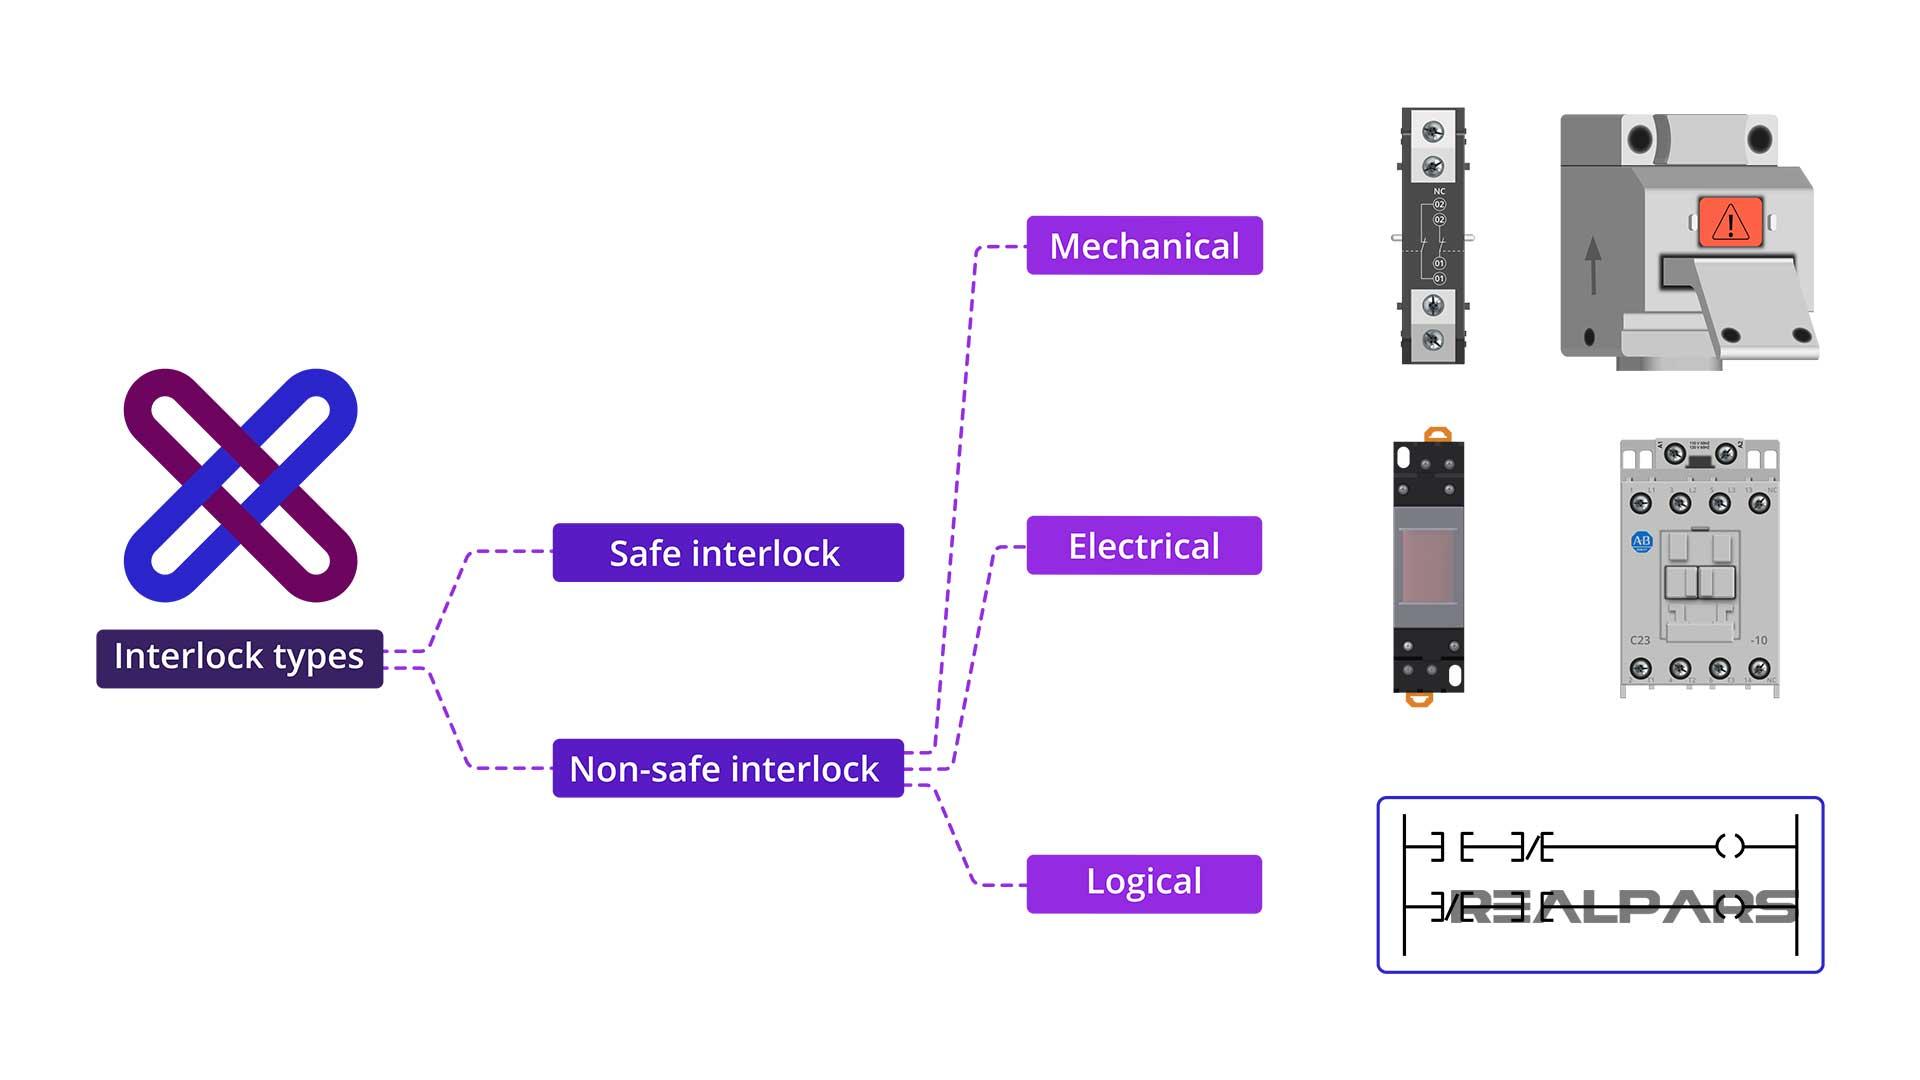 Safe-and-Non-safe-interlock